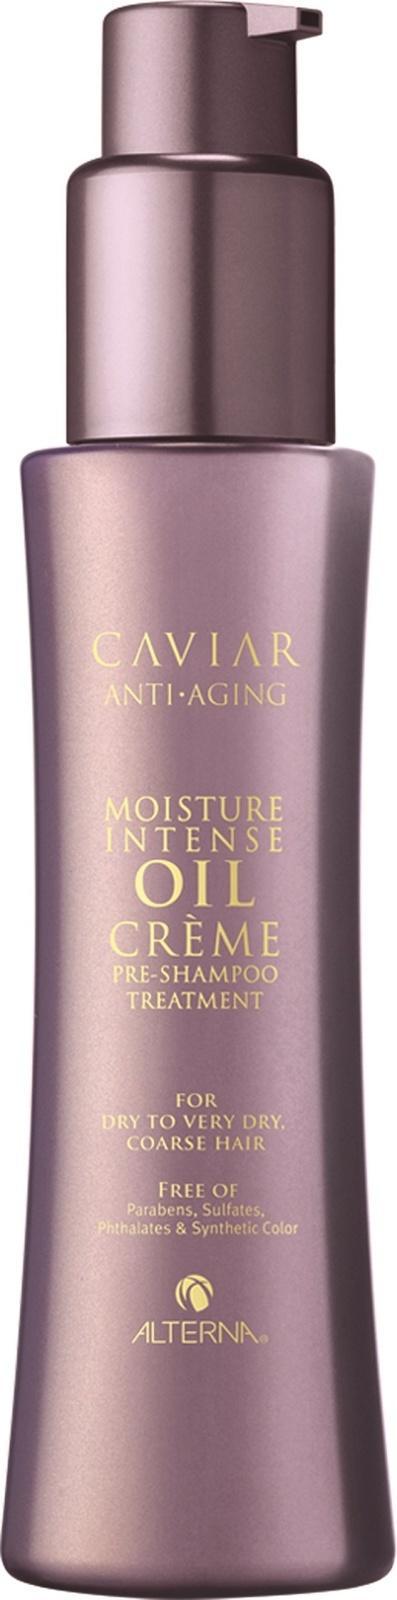 ALTERNA Сыворотка подготавливающая - шаг 1 из Системы интенсивного увлажнения / Anti-Aging Moisture Intense Oil Creme Pre-Shampoo Treatment CAVIAR 125 мл